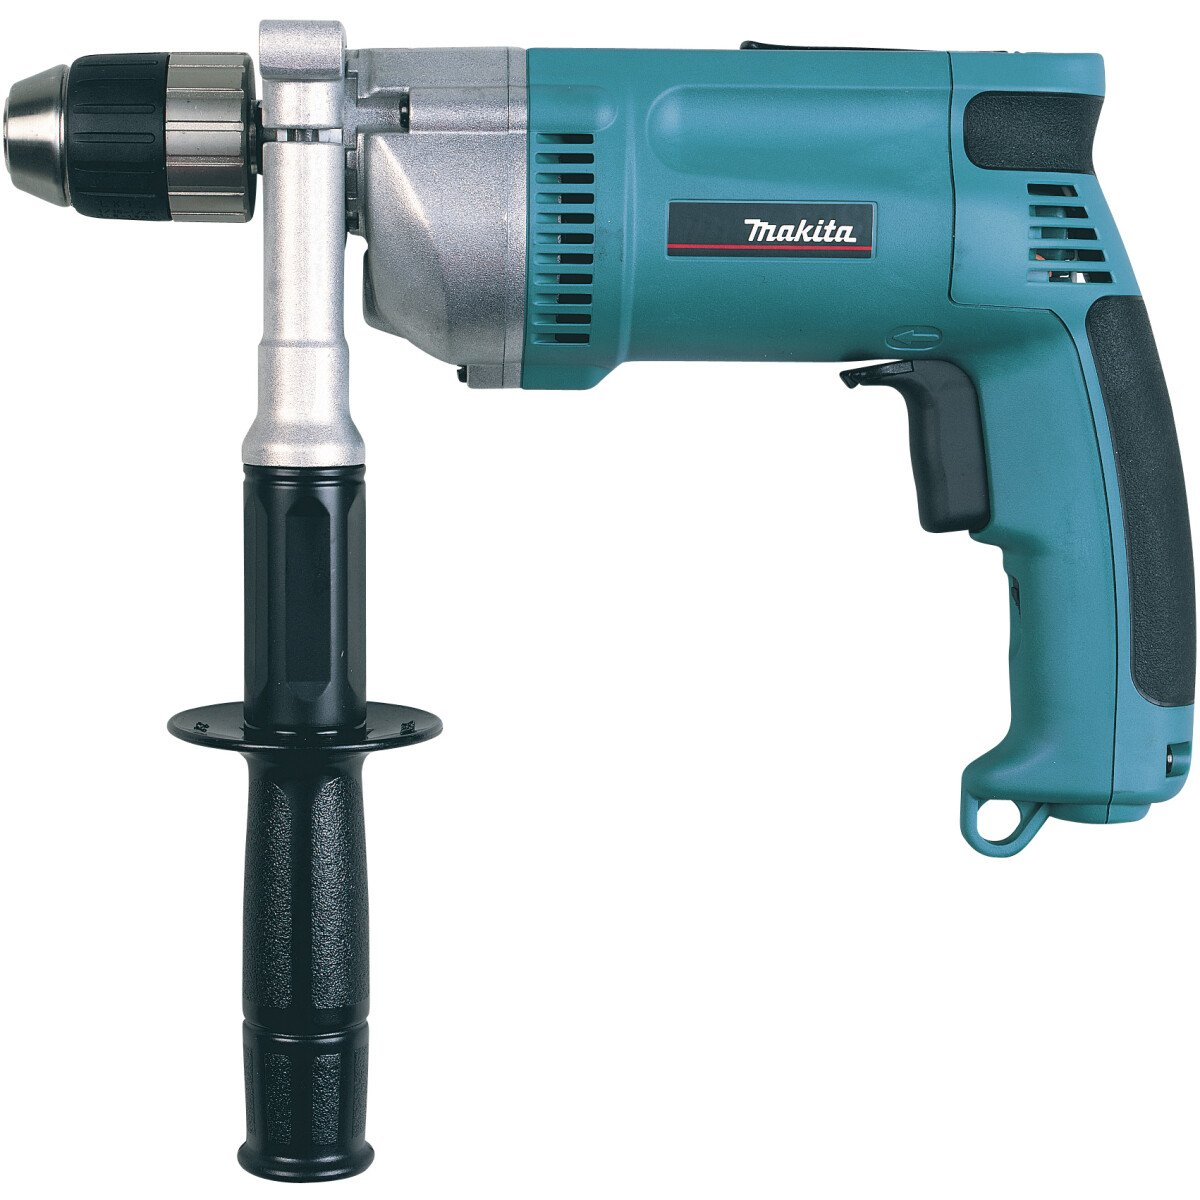 Makita DP4003 13mm Rotary Drill 750 watt